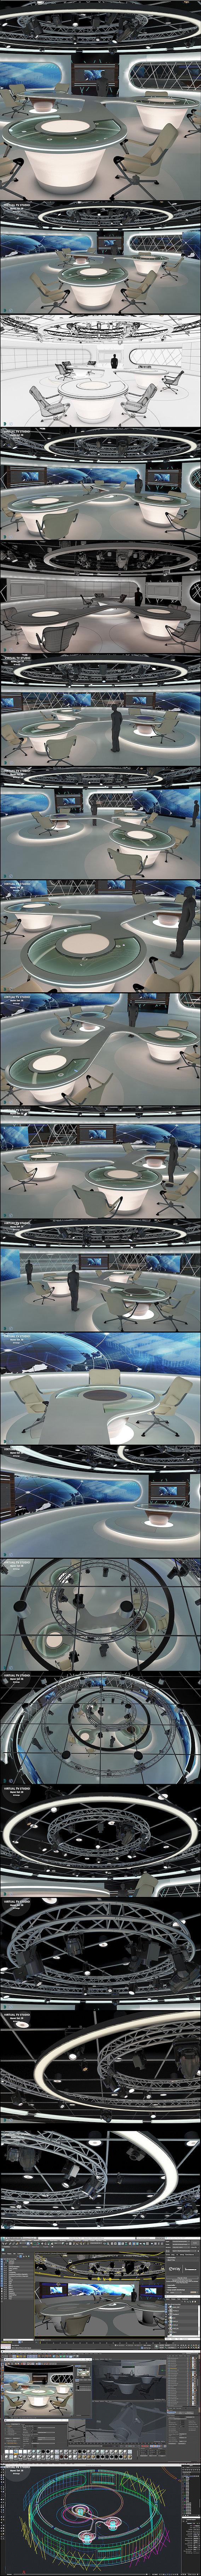 Virtual TV Studio News Set 28 - 3D Model Designs